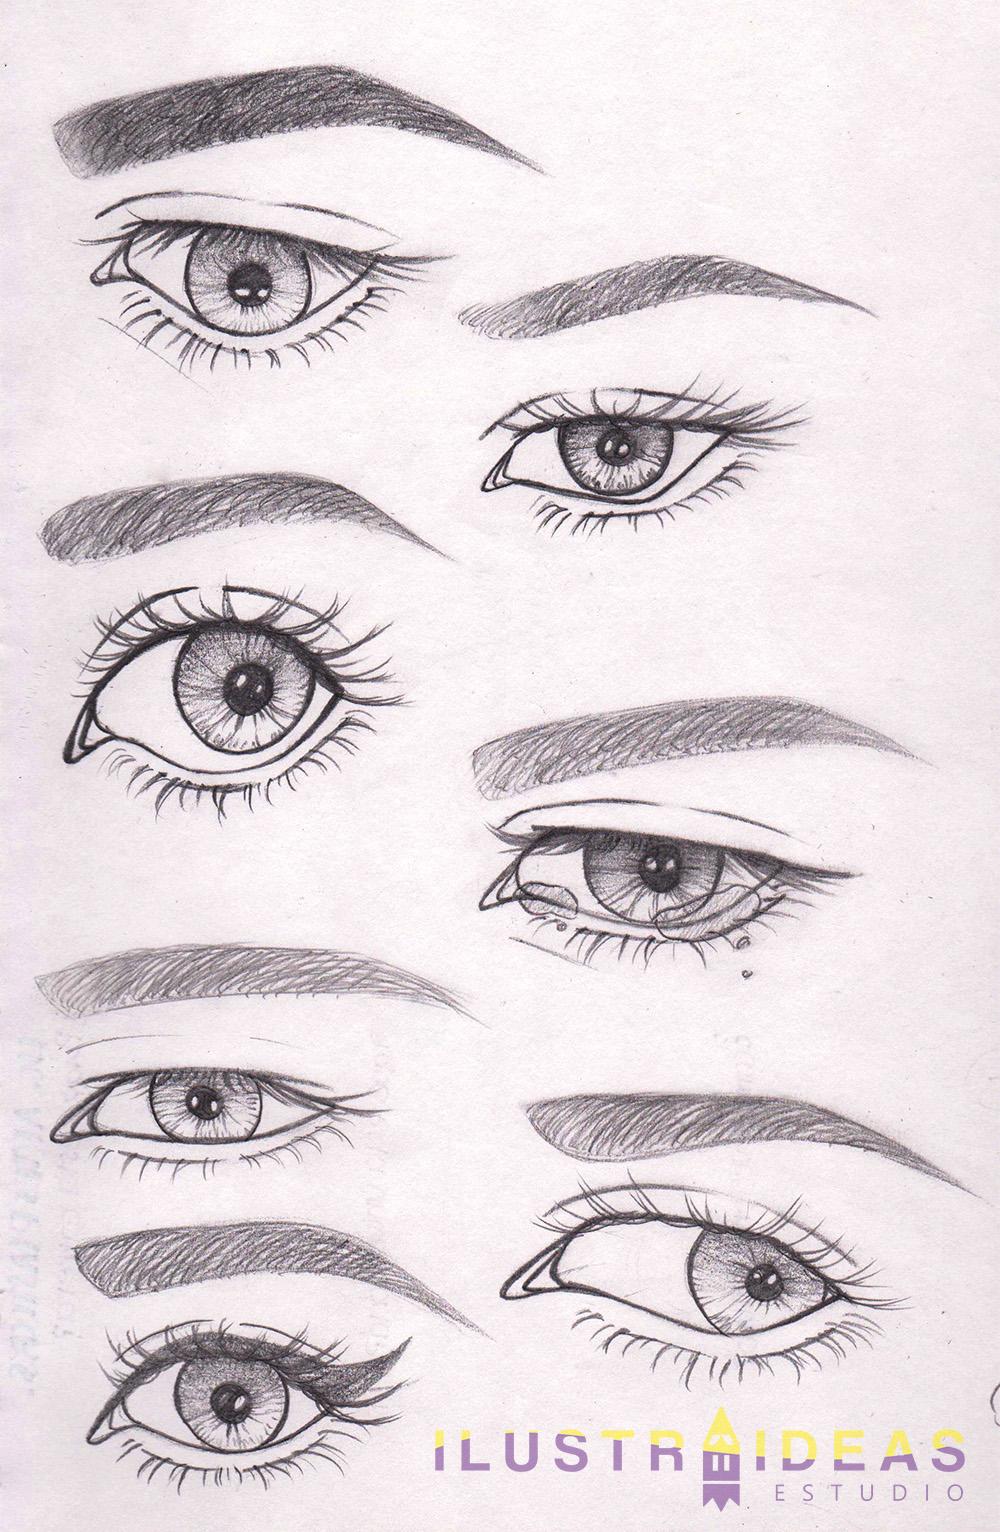 Dibujando ojos de personas animadas | IlustraIdeas